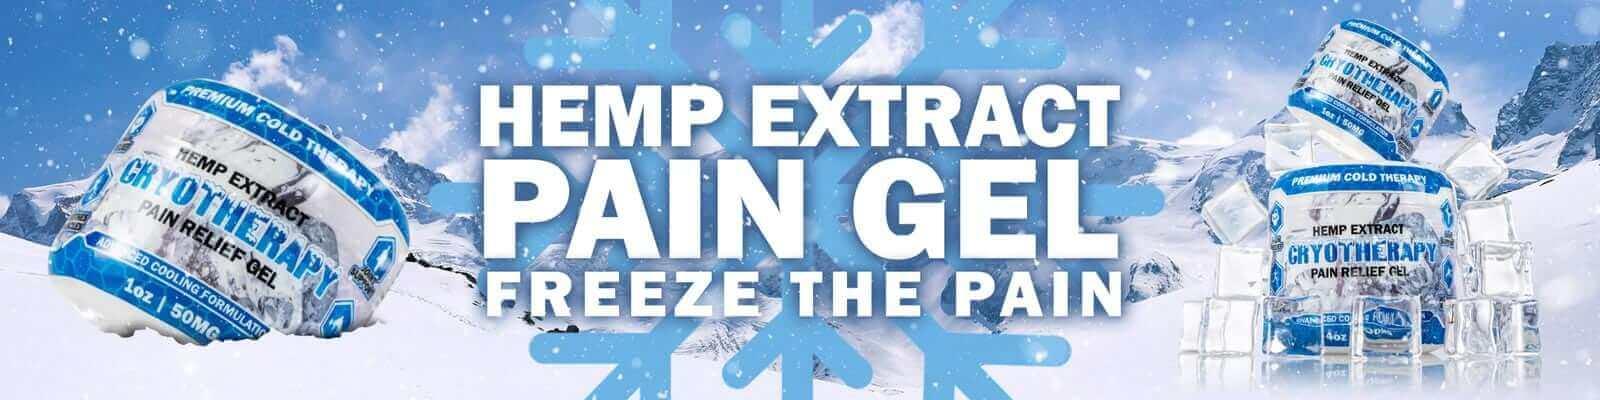 Hemp Extract Pain Gel